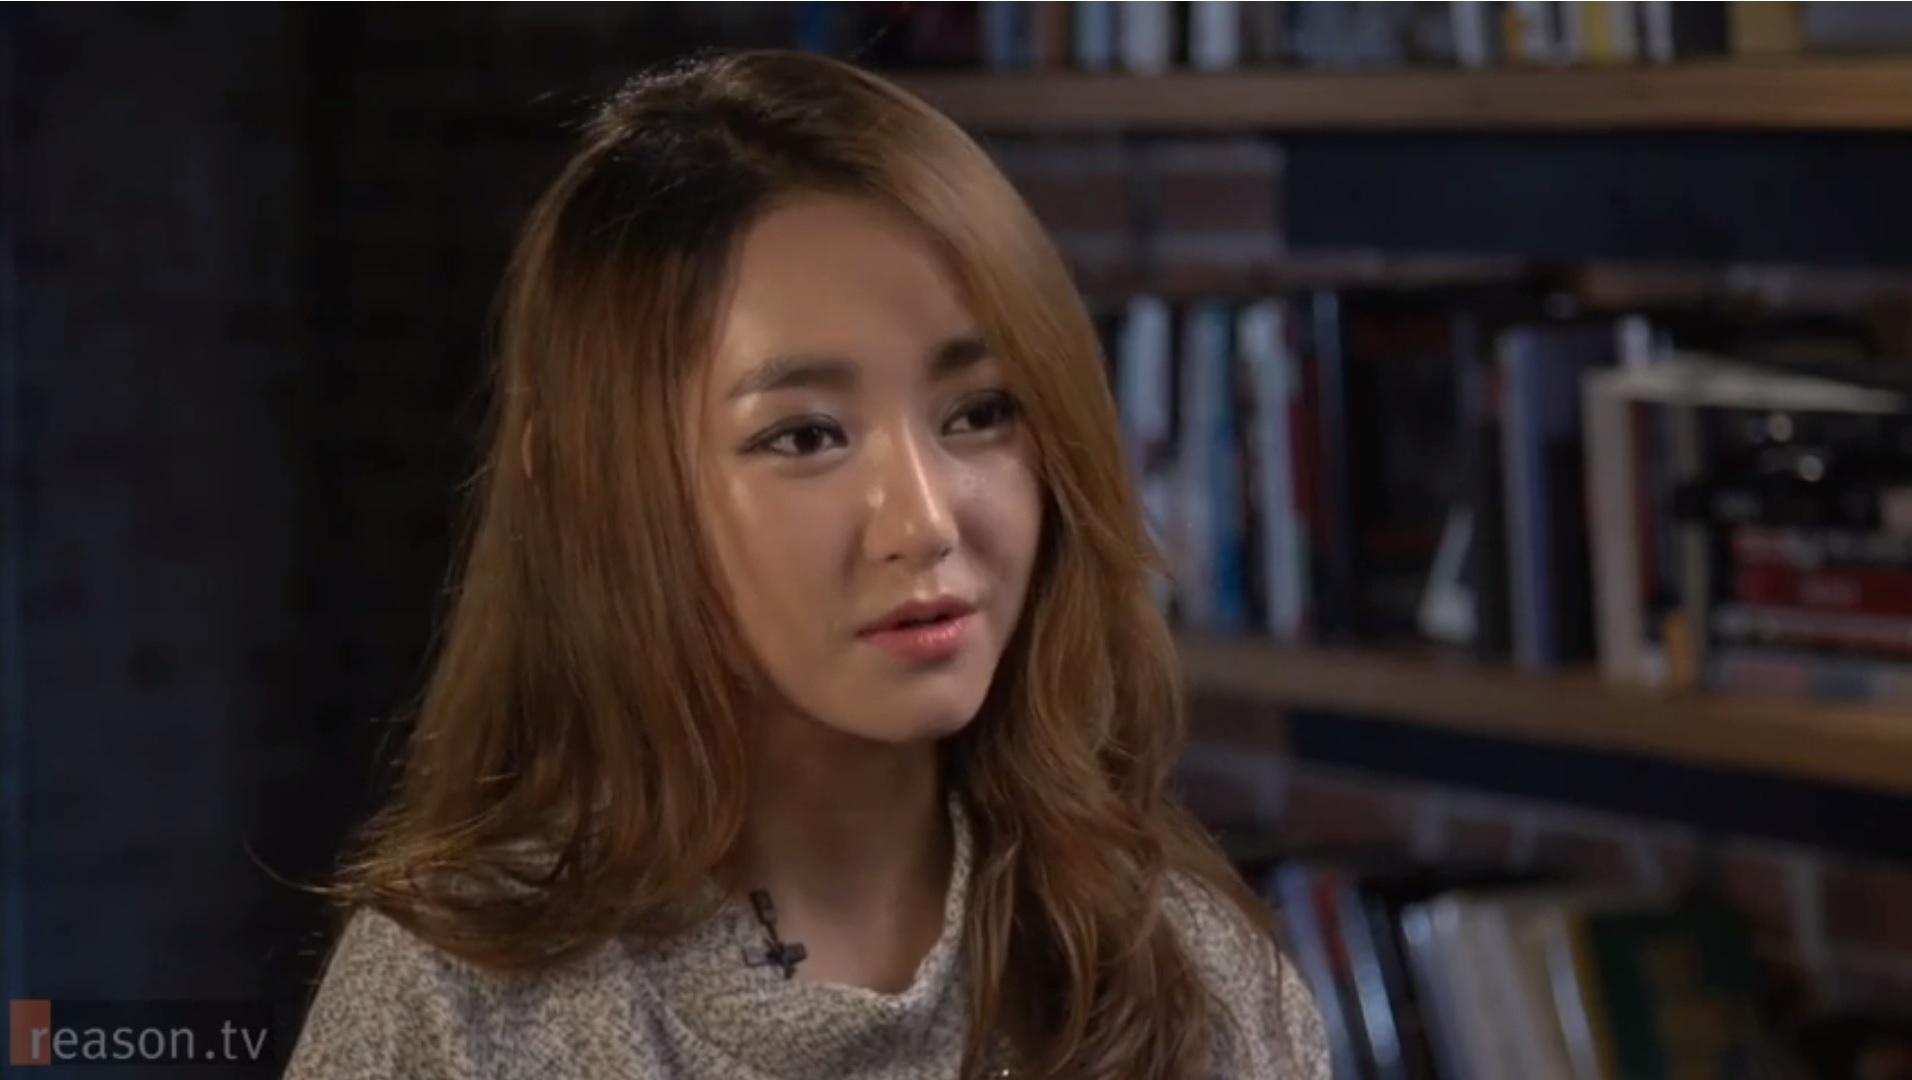 Yeonmi Park Reason TV